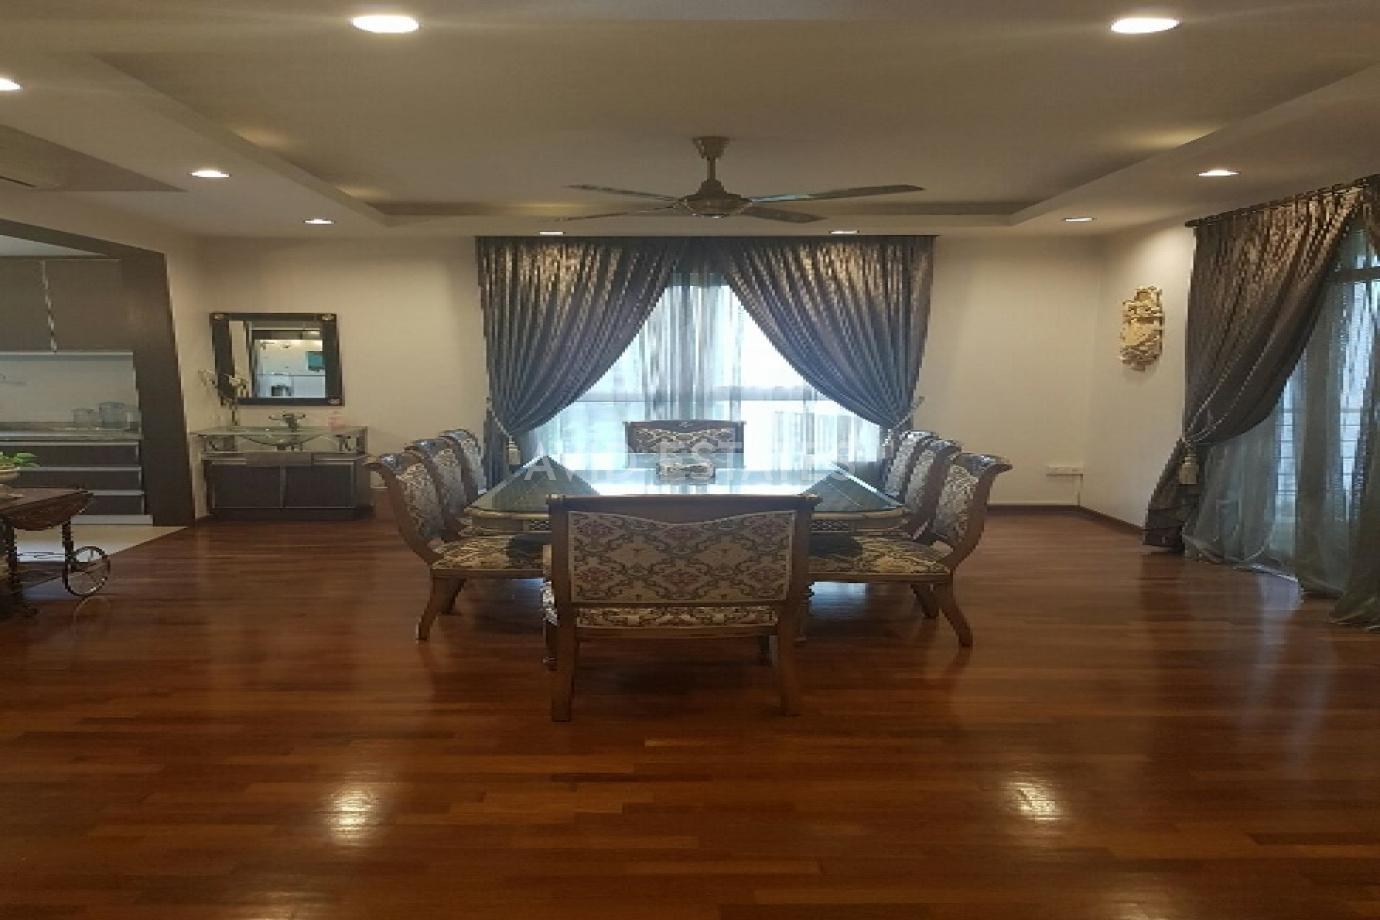 Hijauan Kiara, Mont Kiara,Kuala Lumpur, 4 Bedrooms Bedrooms, ,5 BathroomsBathrooms,Condominium / Serviced Residence,For Sale,Hijauan Kiara,Jalan Kiara 5 ,1308